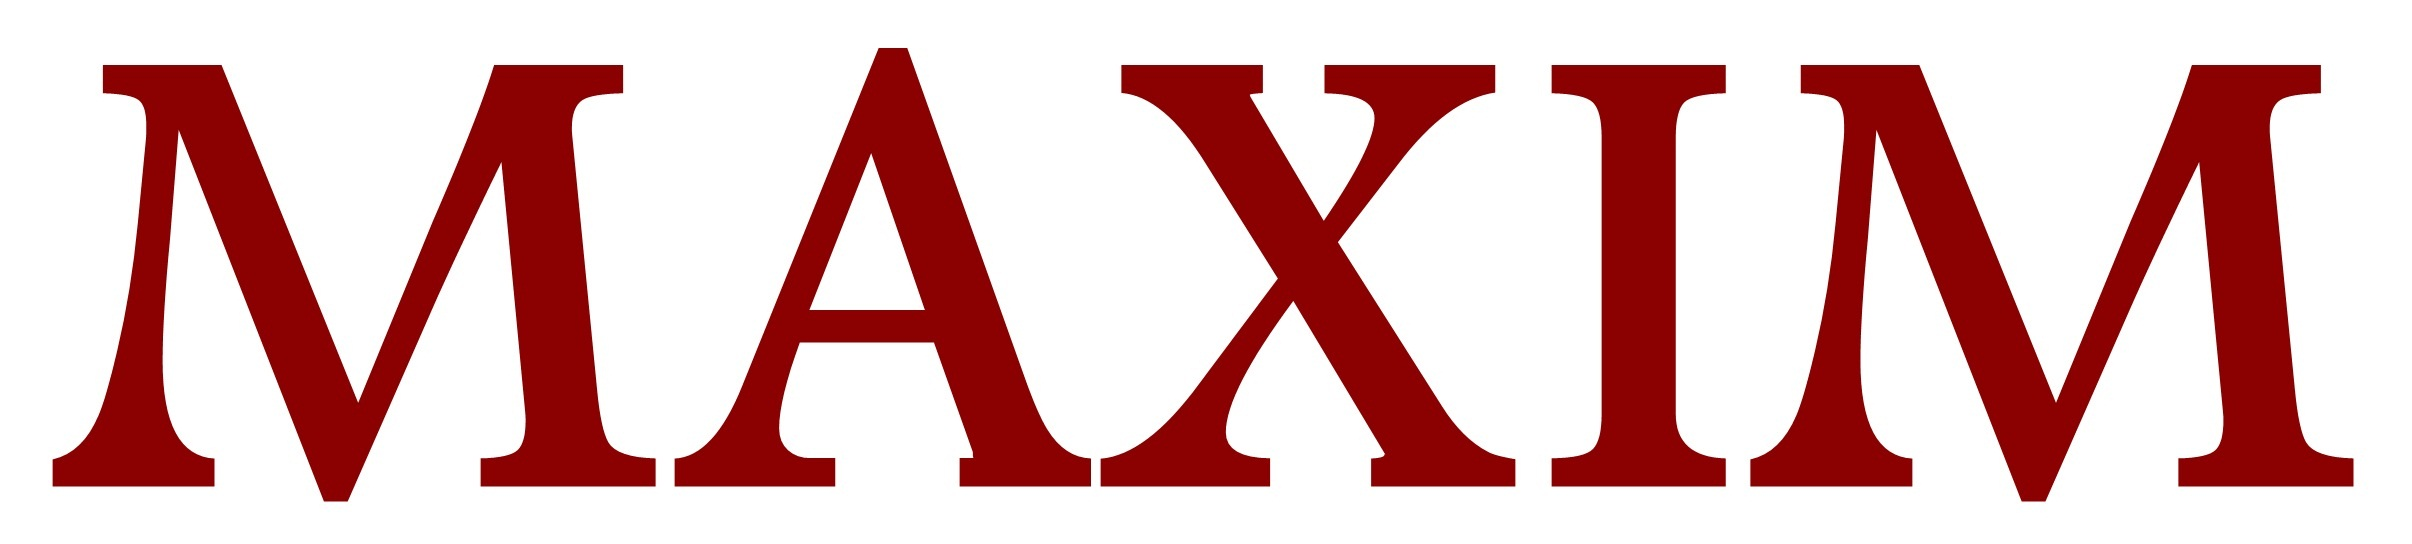 maxim-magazine-logo.jpg